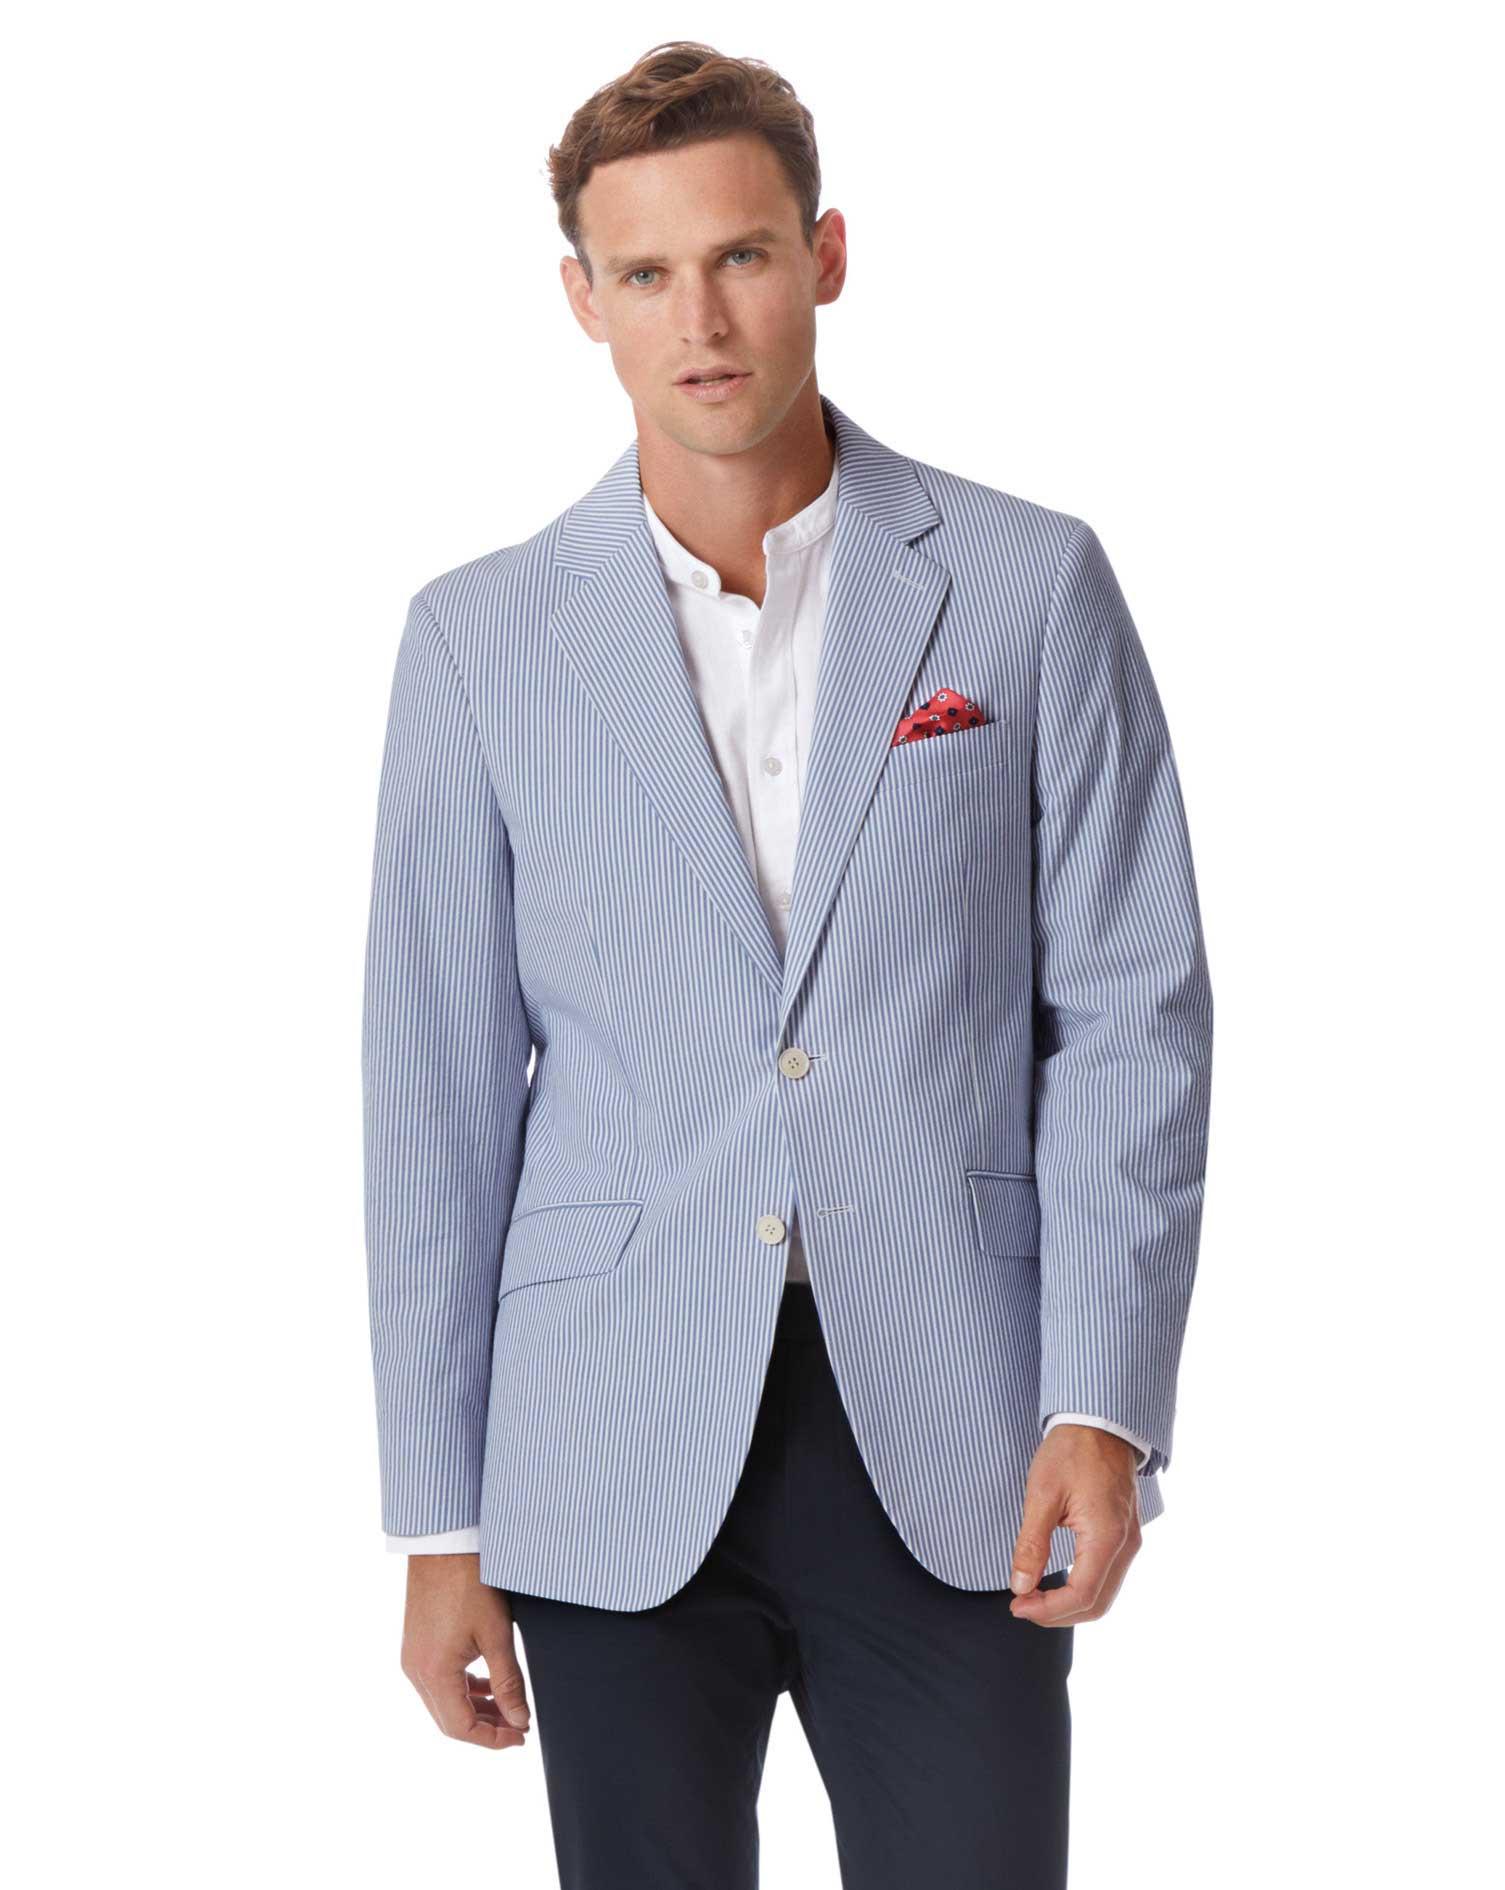 Classic Fit Blue Striped Cotton Seersucker Jacket Size 40 Regular by Charles Tyrwhitt